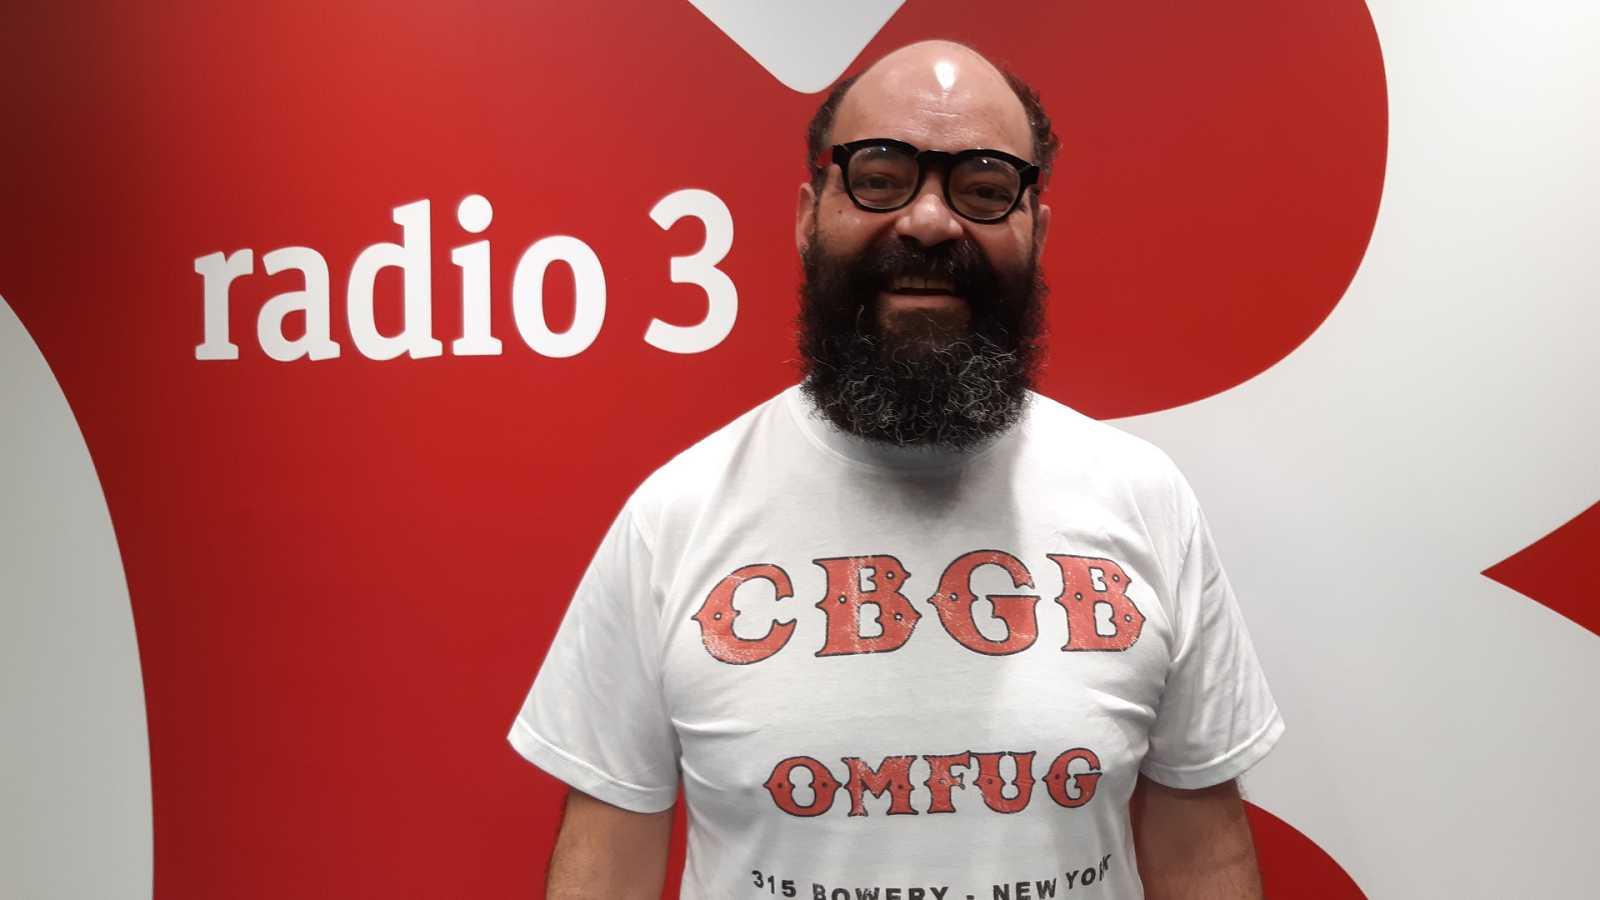 En Radio 3 - Ignatius Farray - 13/02/21 - escuchar ahora